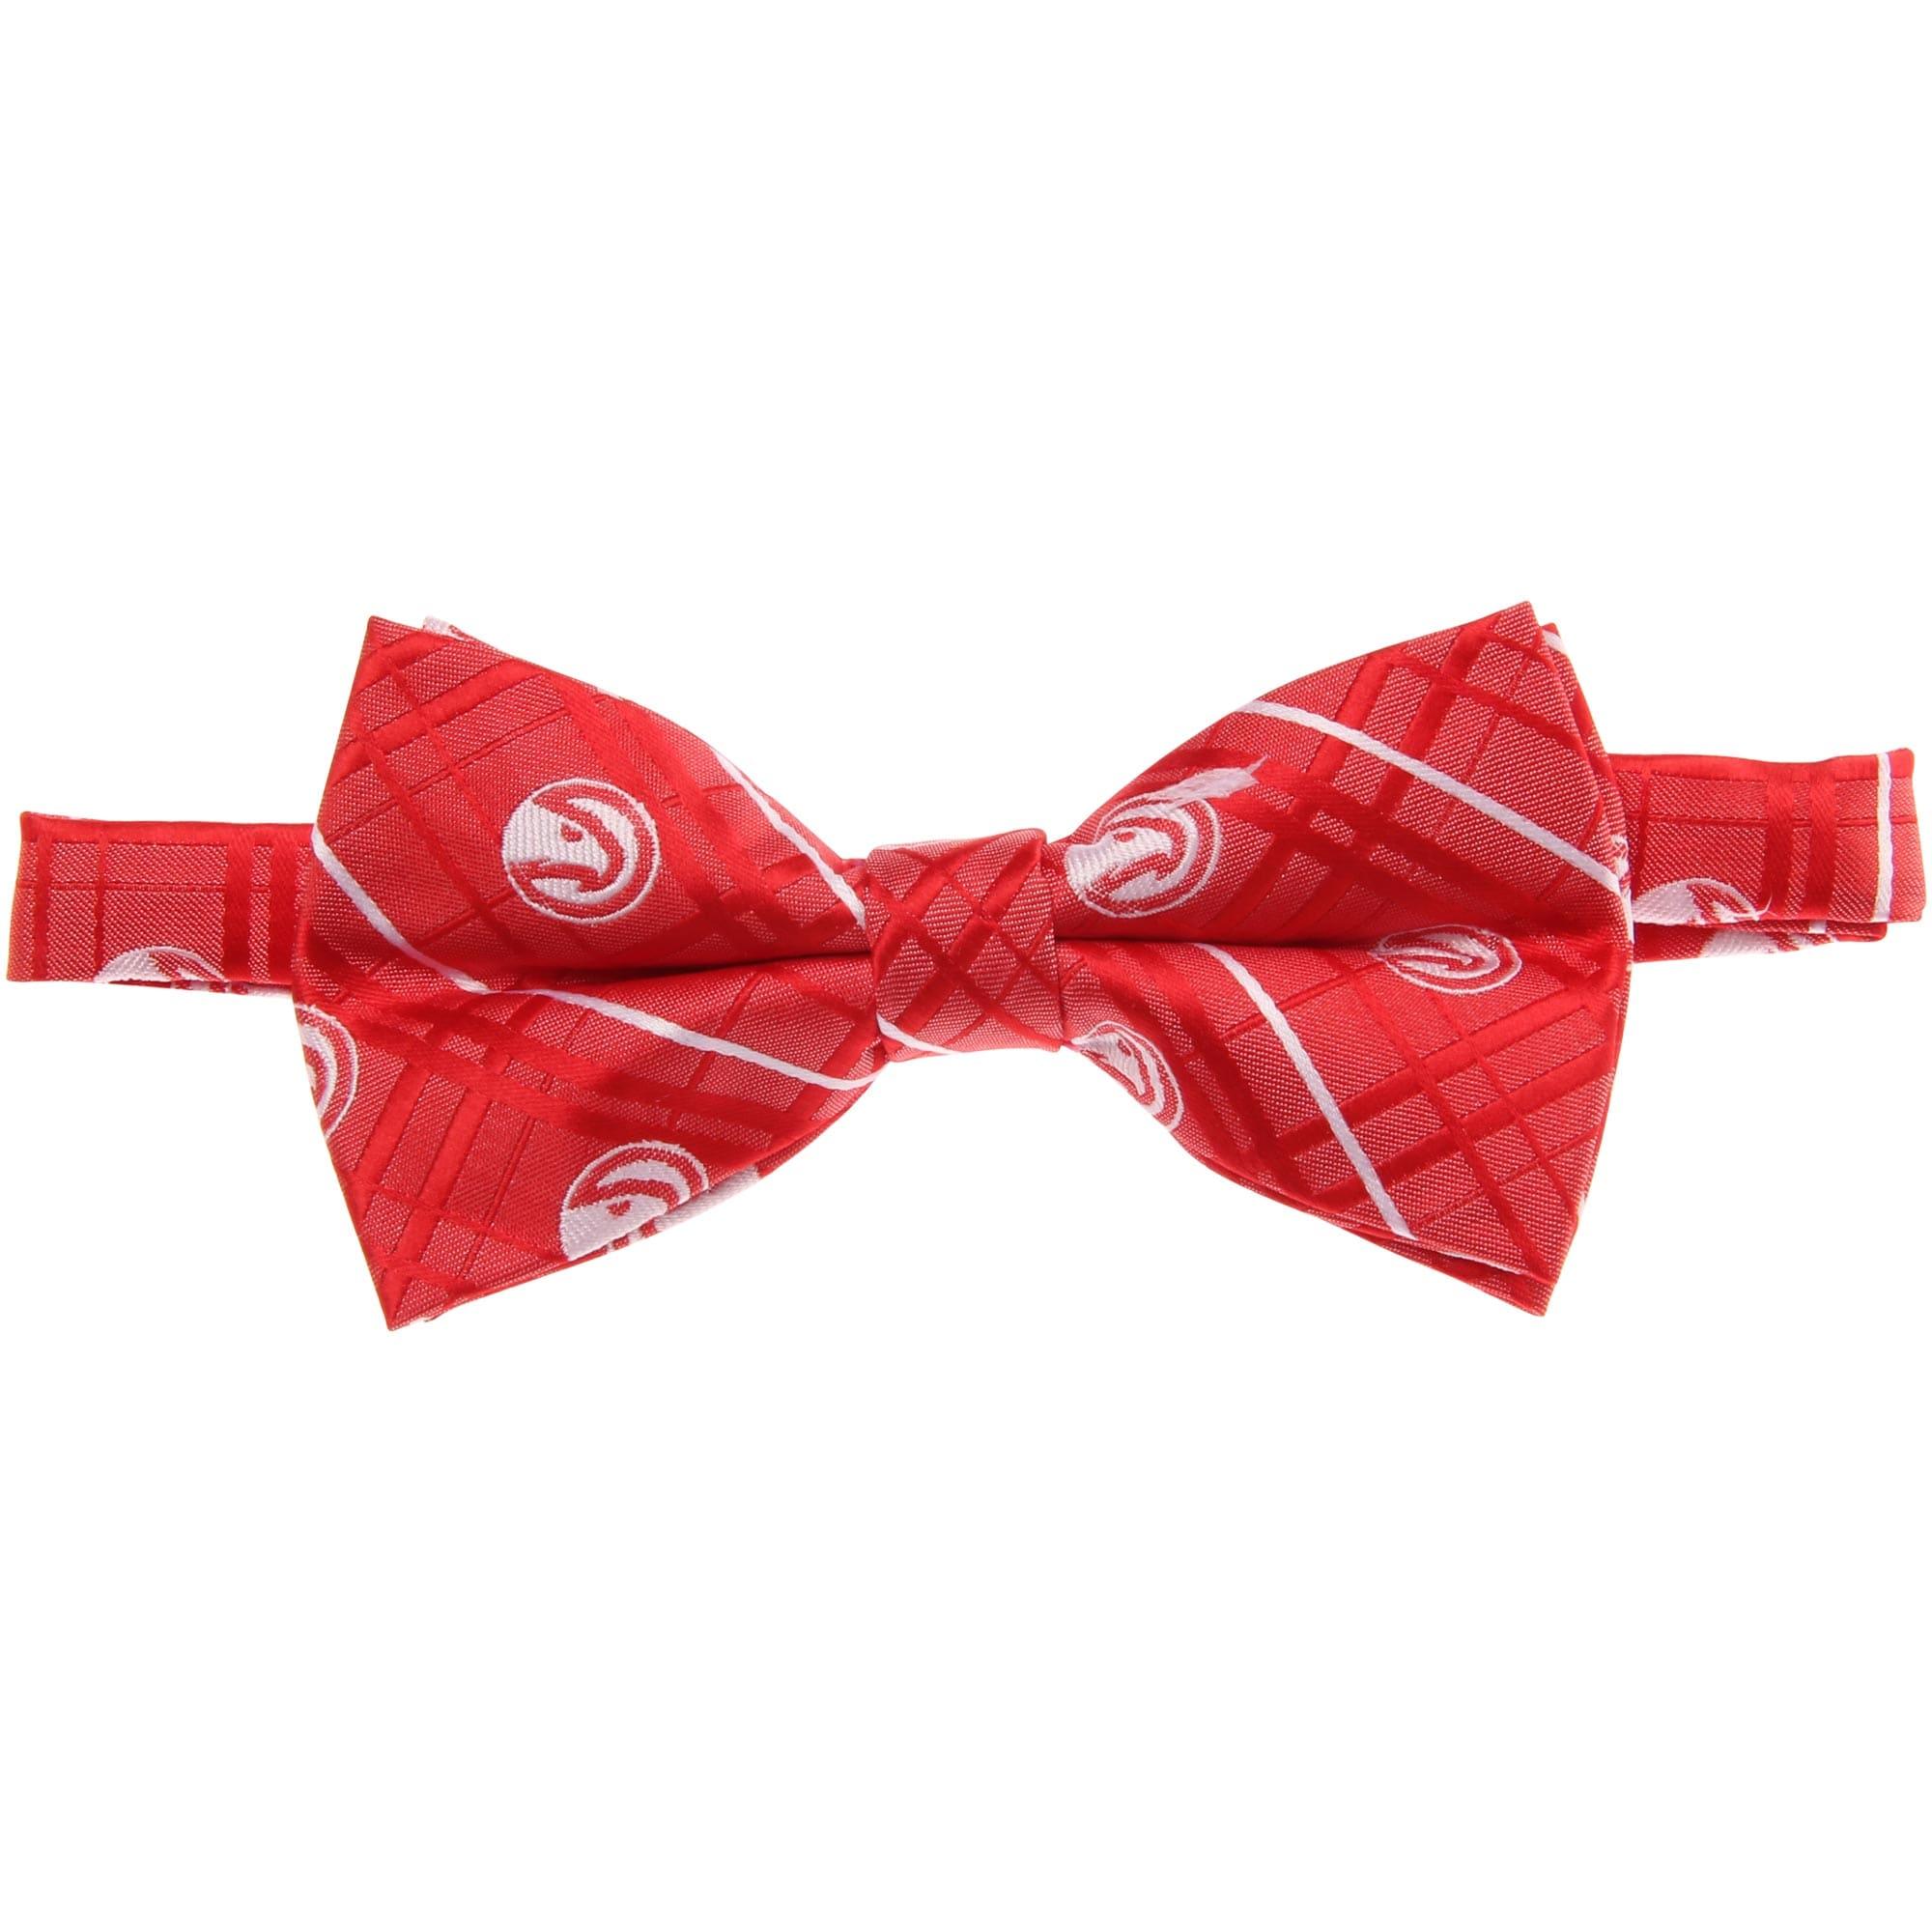 Atlanta Hawks Oxford Bow Tie - Red